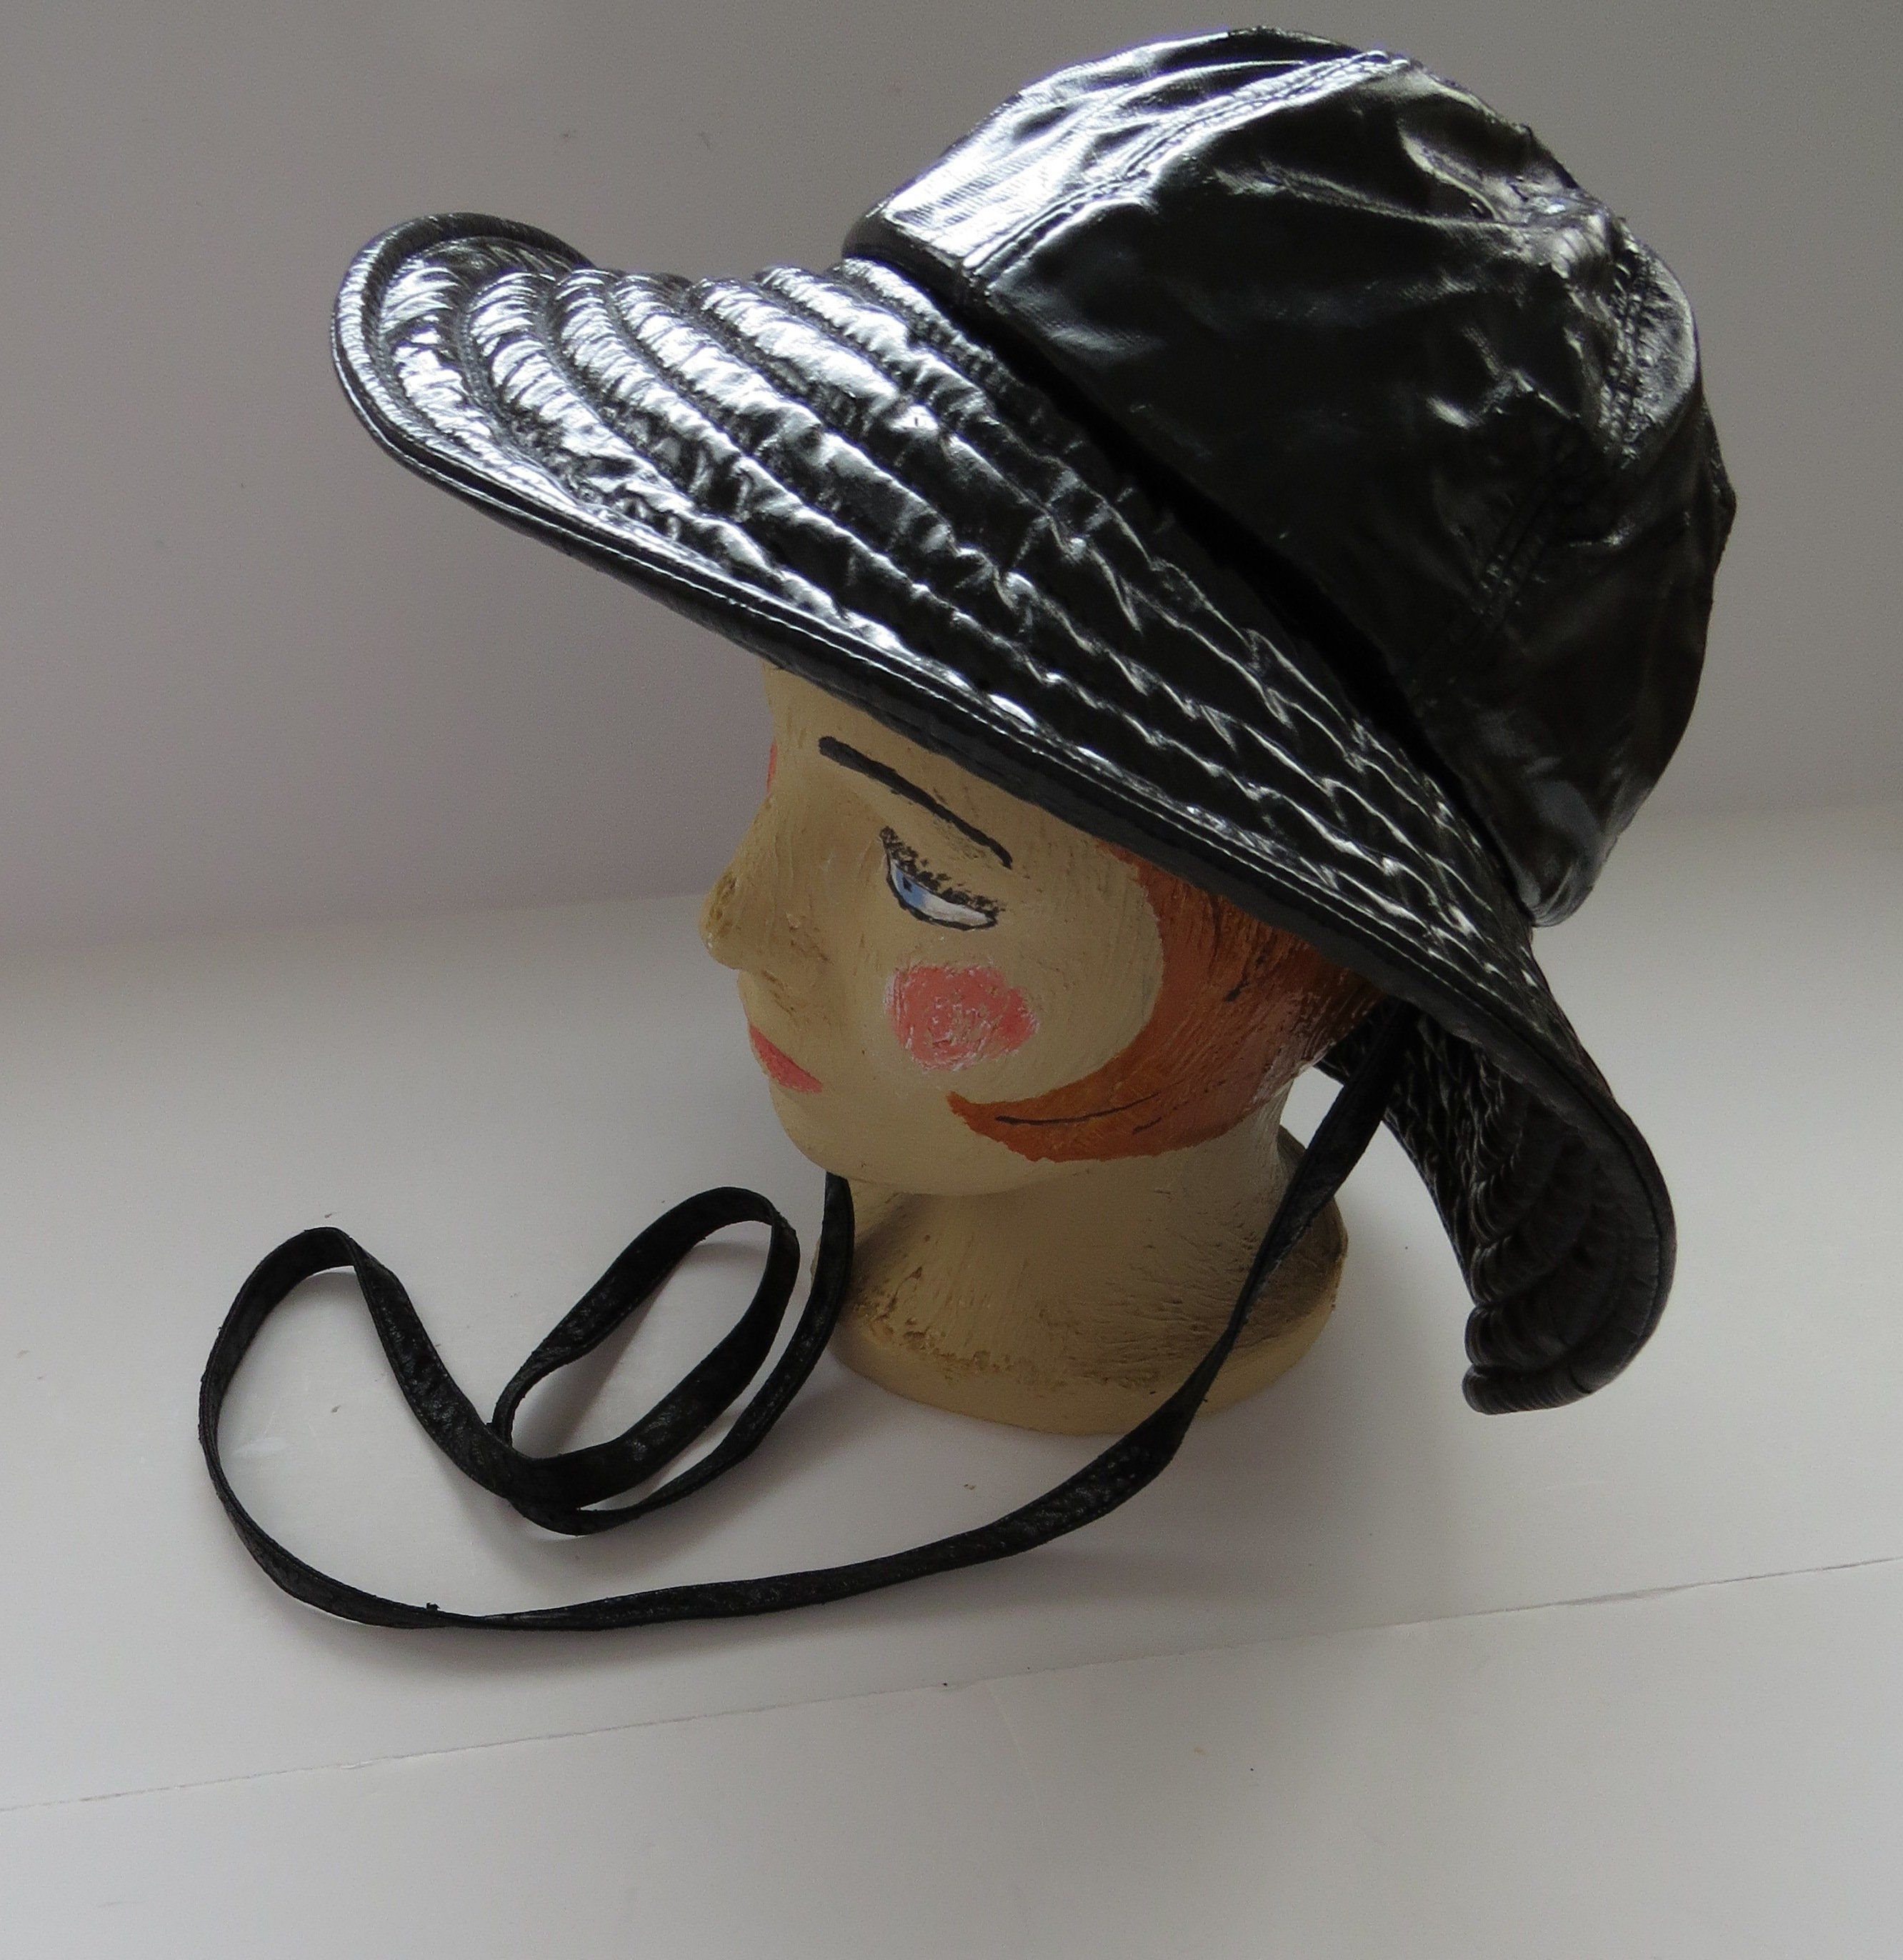 d6f5e192acf93 1970s Black Vinyl Rain Hat by Totes - Retro Mod - Chic Stylish Rain Gear -  Wide Brim Bucket Hat - Vintage Womens Fashion Accessories